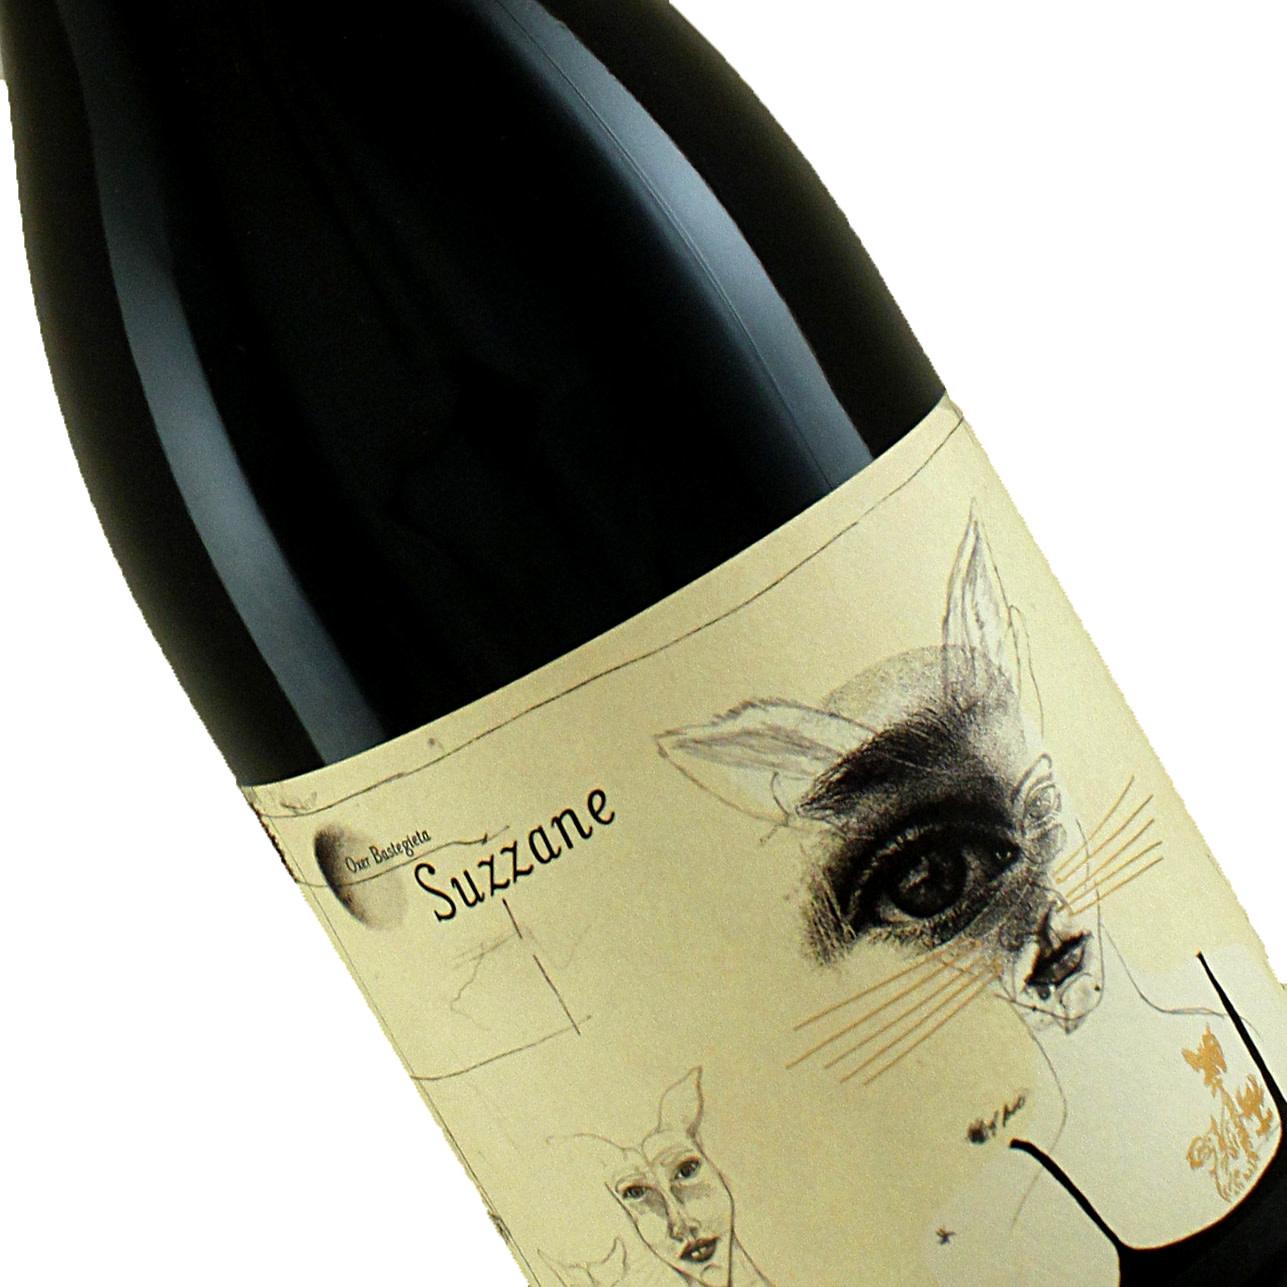 Oxer Bastegieta  2018 Rioja Garnacha Suzzane,  Rioja Spain